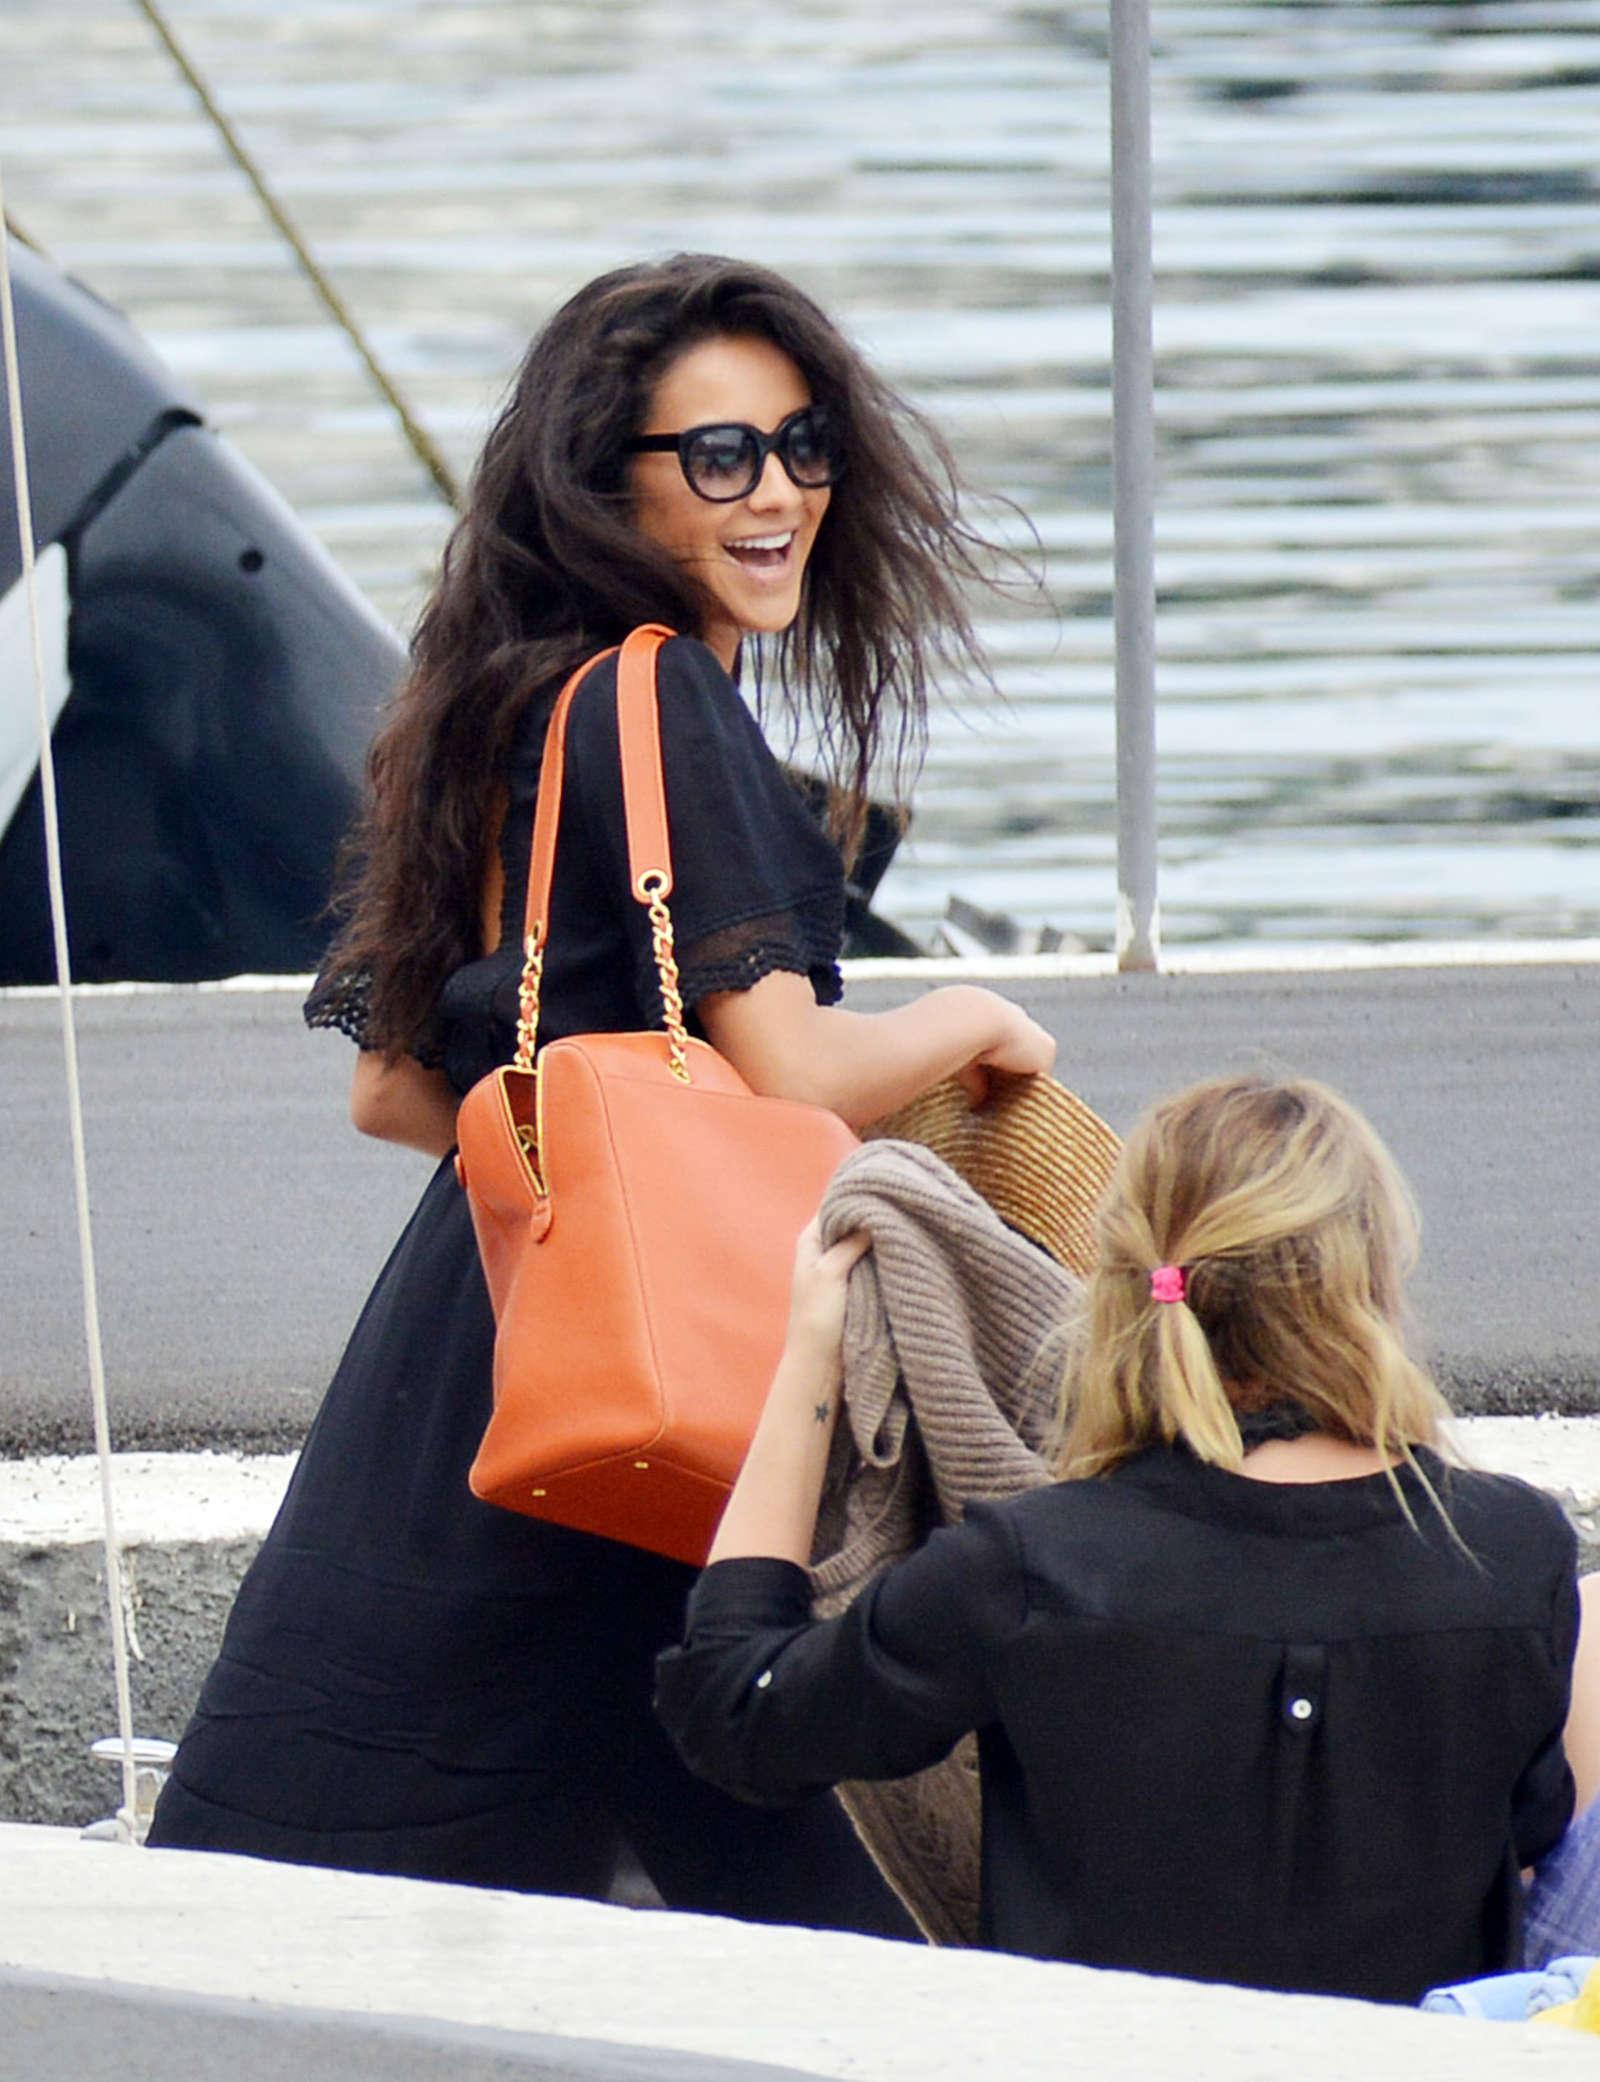 Ashley Benson 2016 : Ashley Benson, Shay Mitchell and Troian Bellisario on a boat in Capri -32